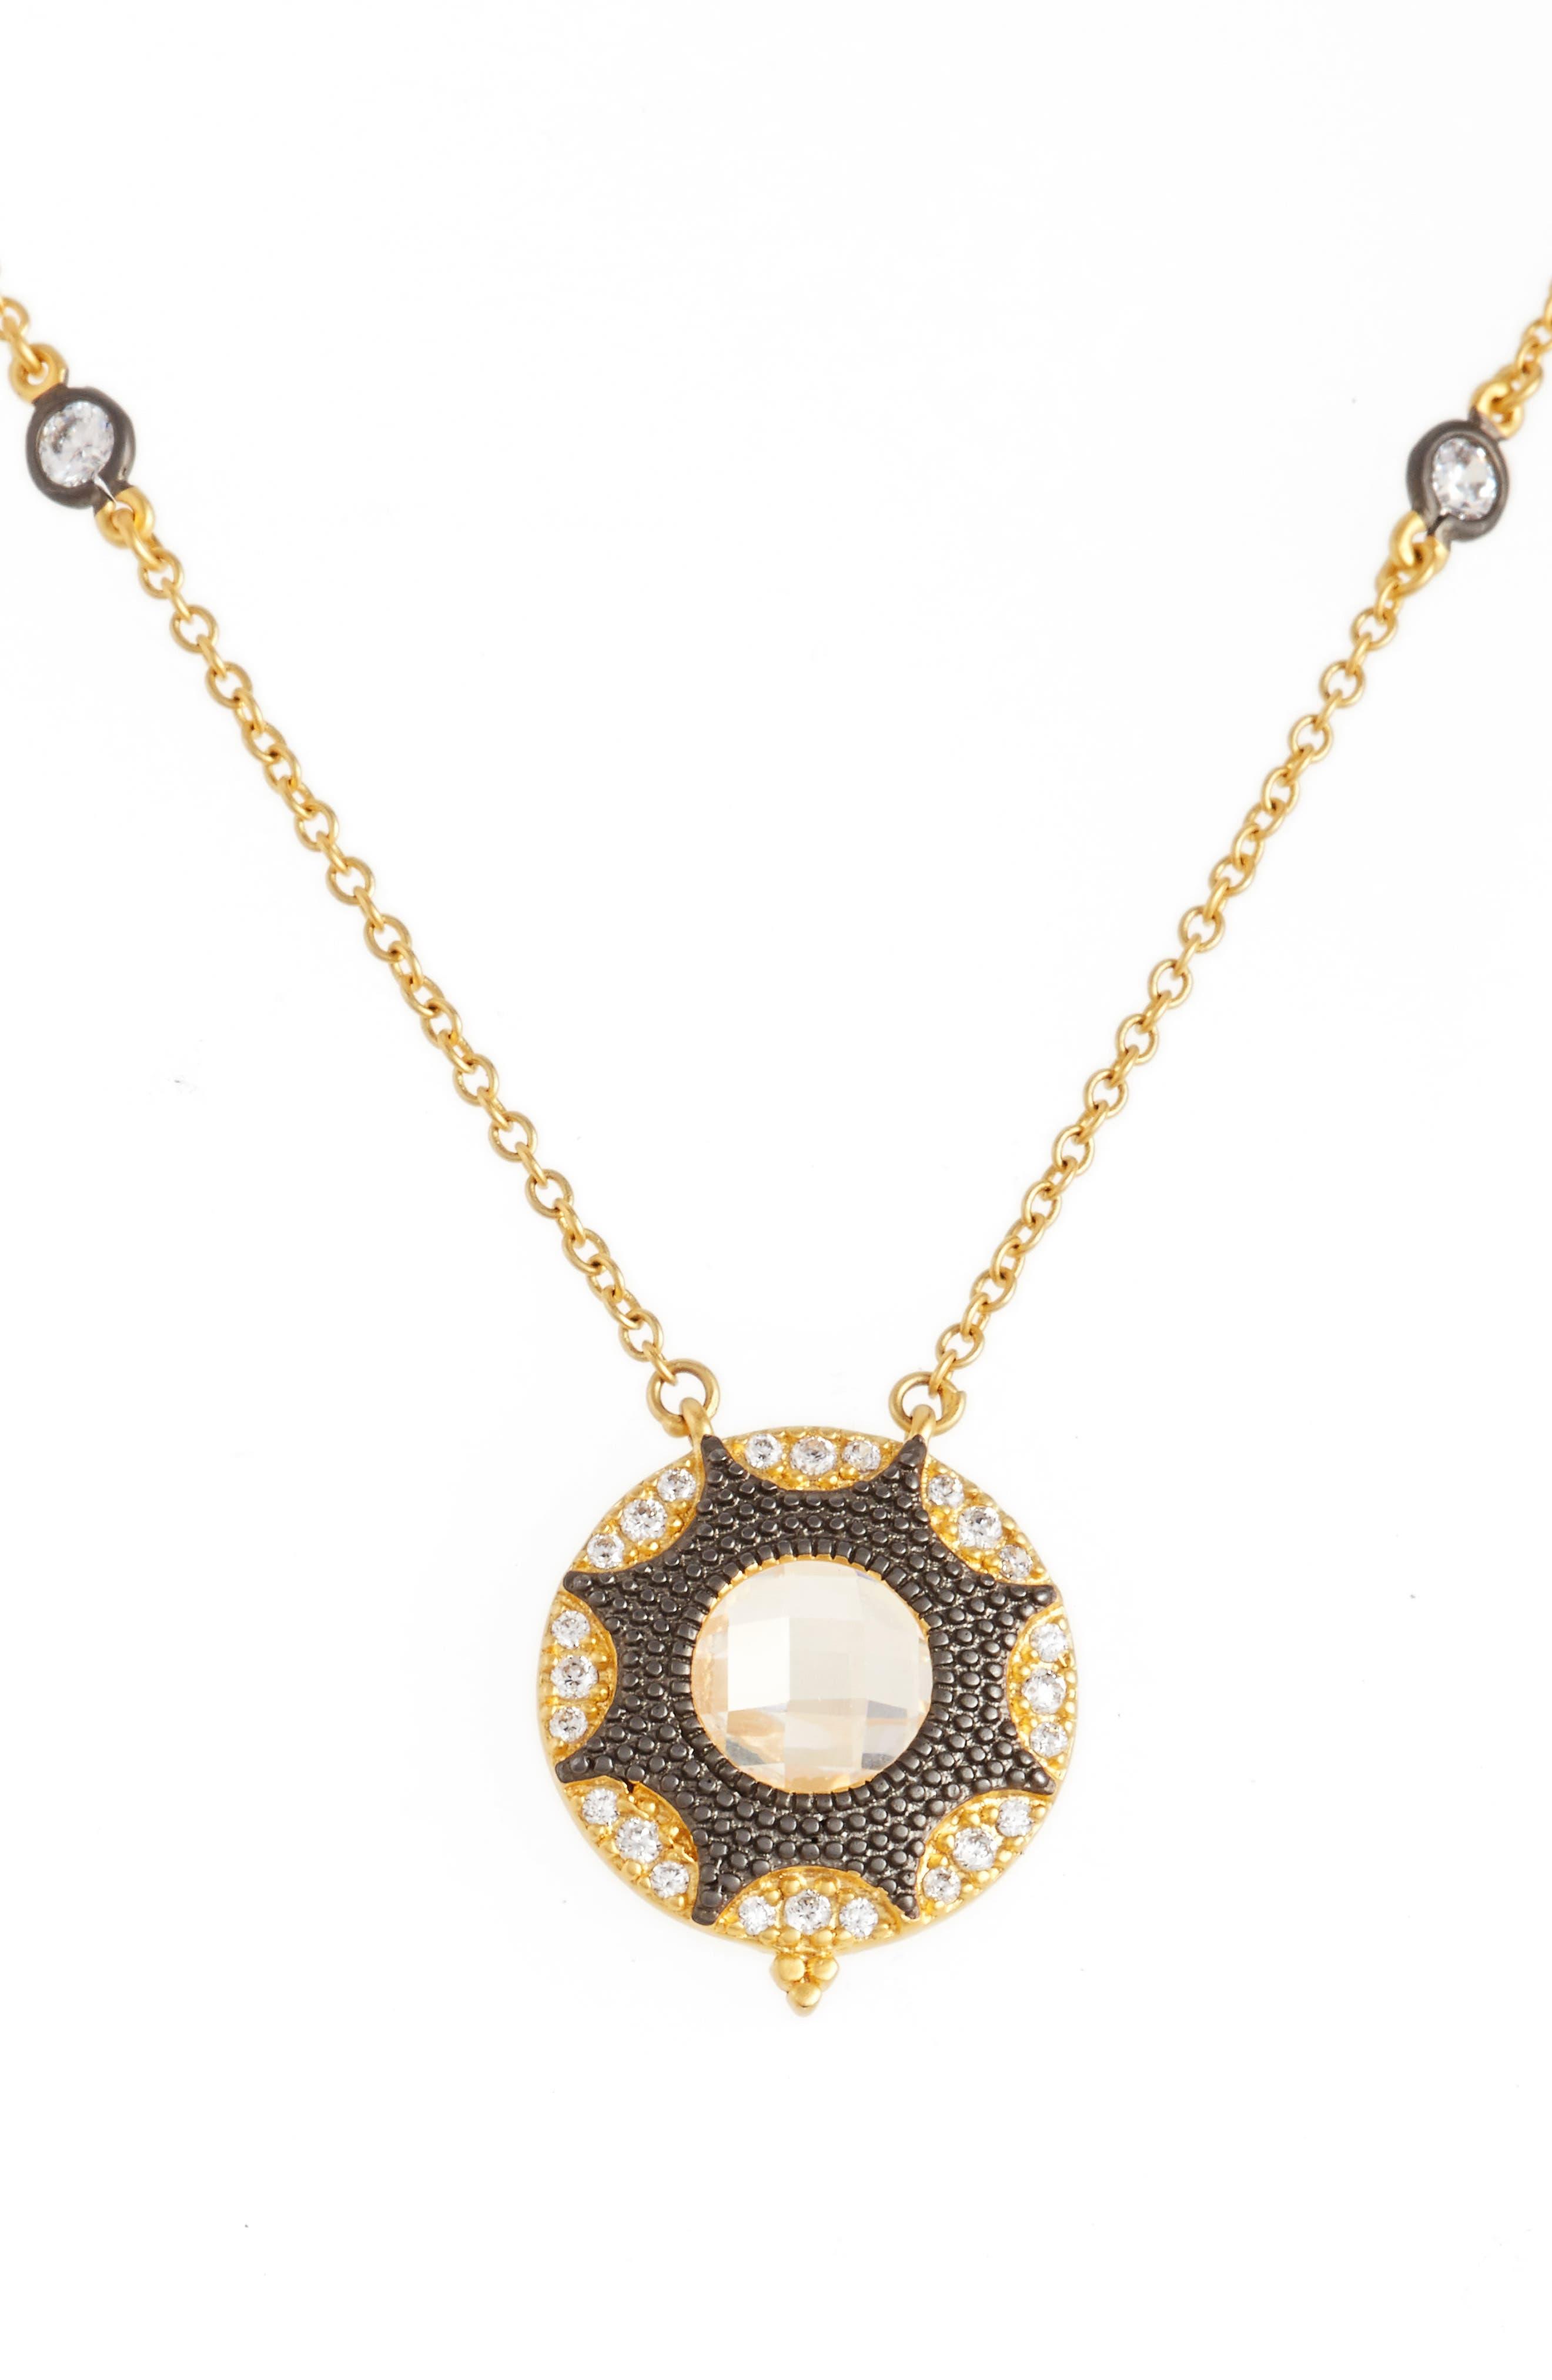 Main Image - FREIDA ROTHMAN Round Pendant Necklace